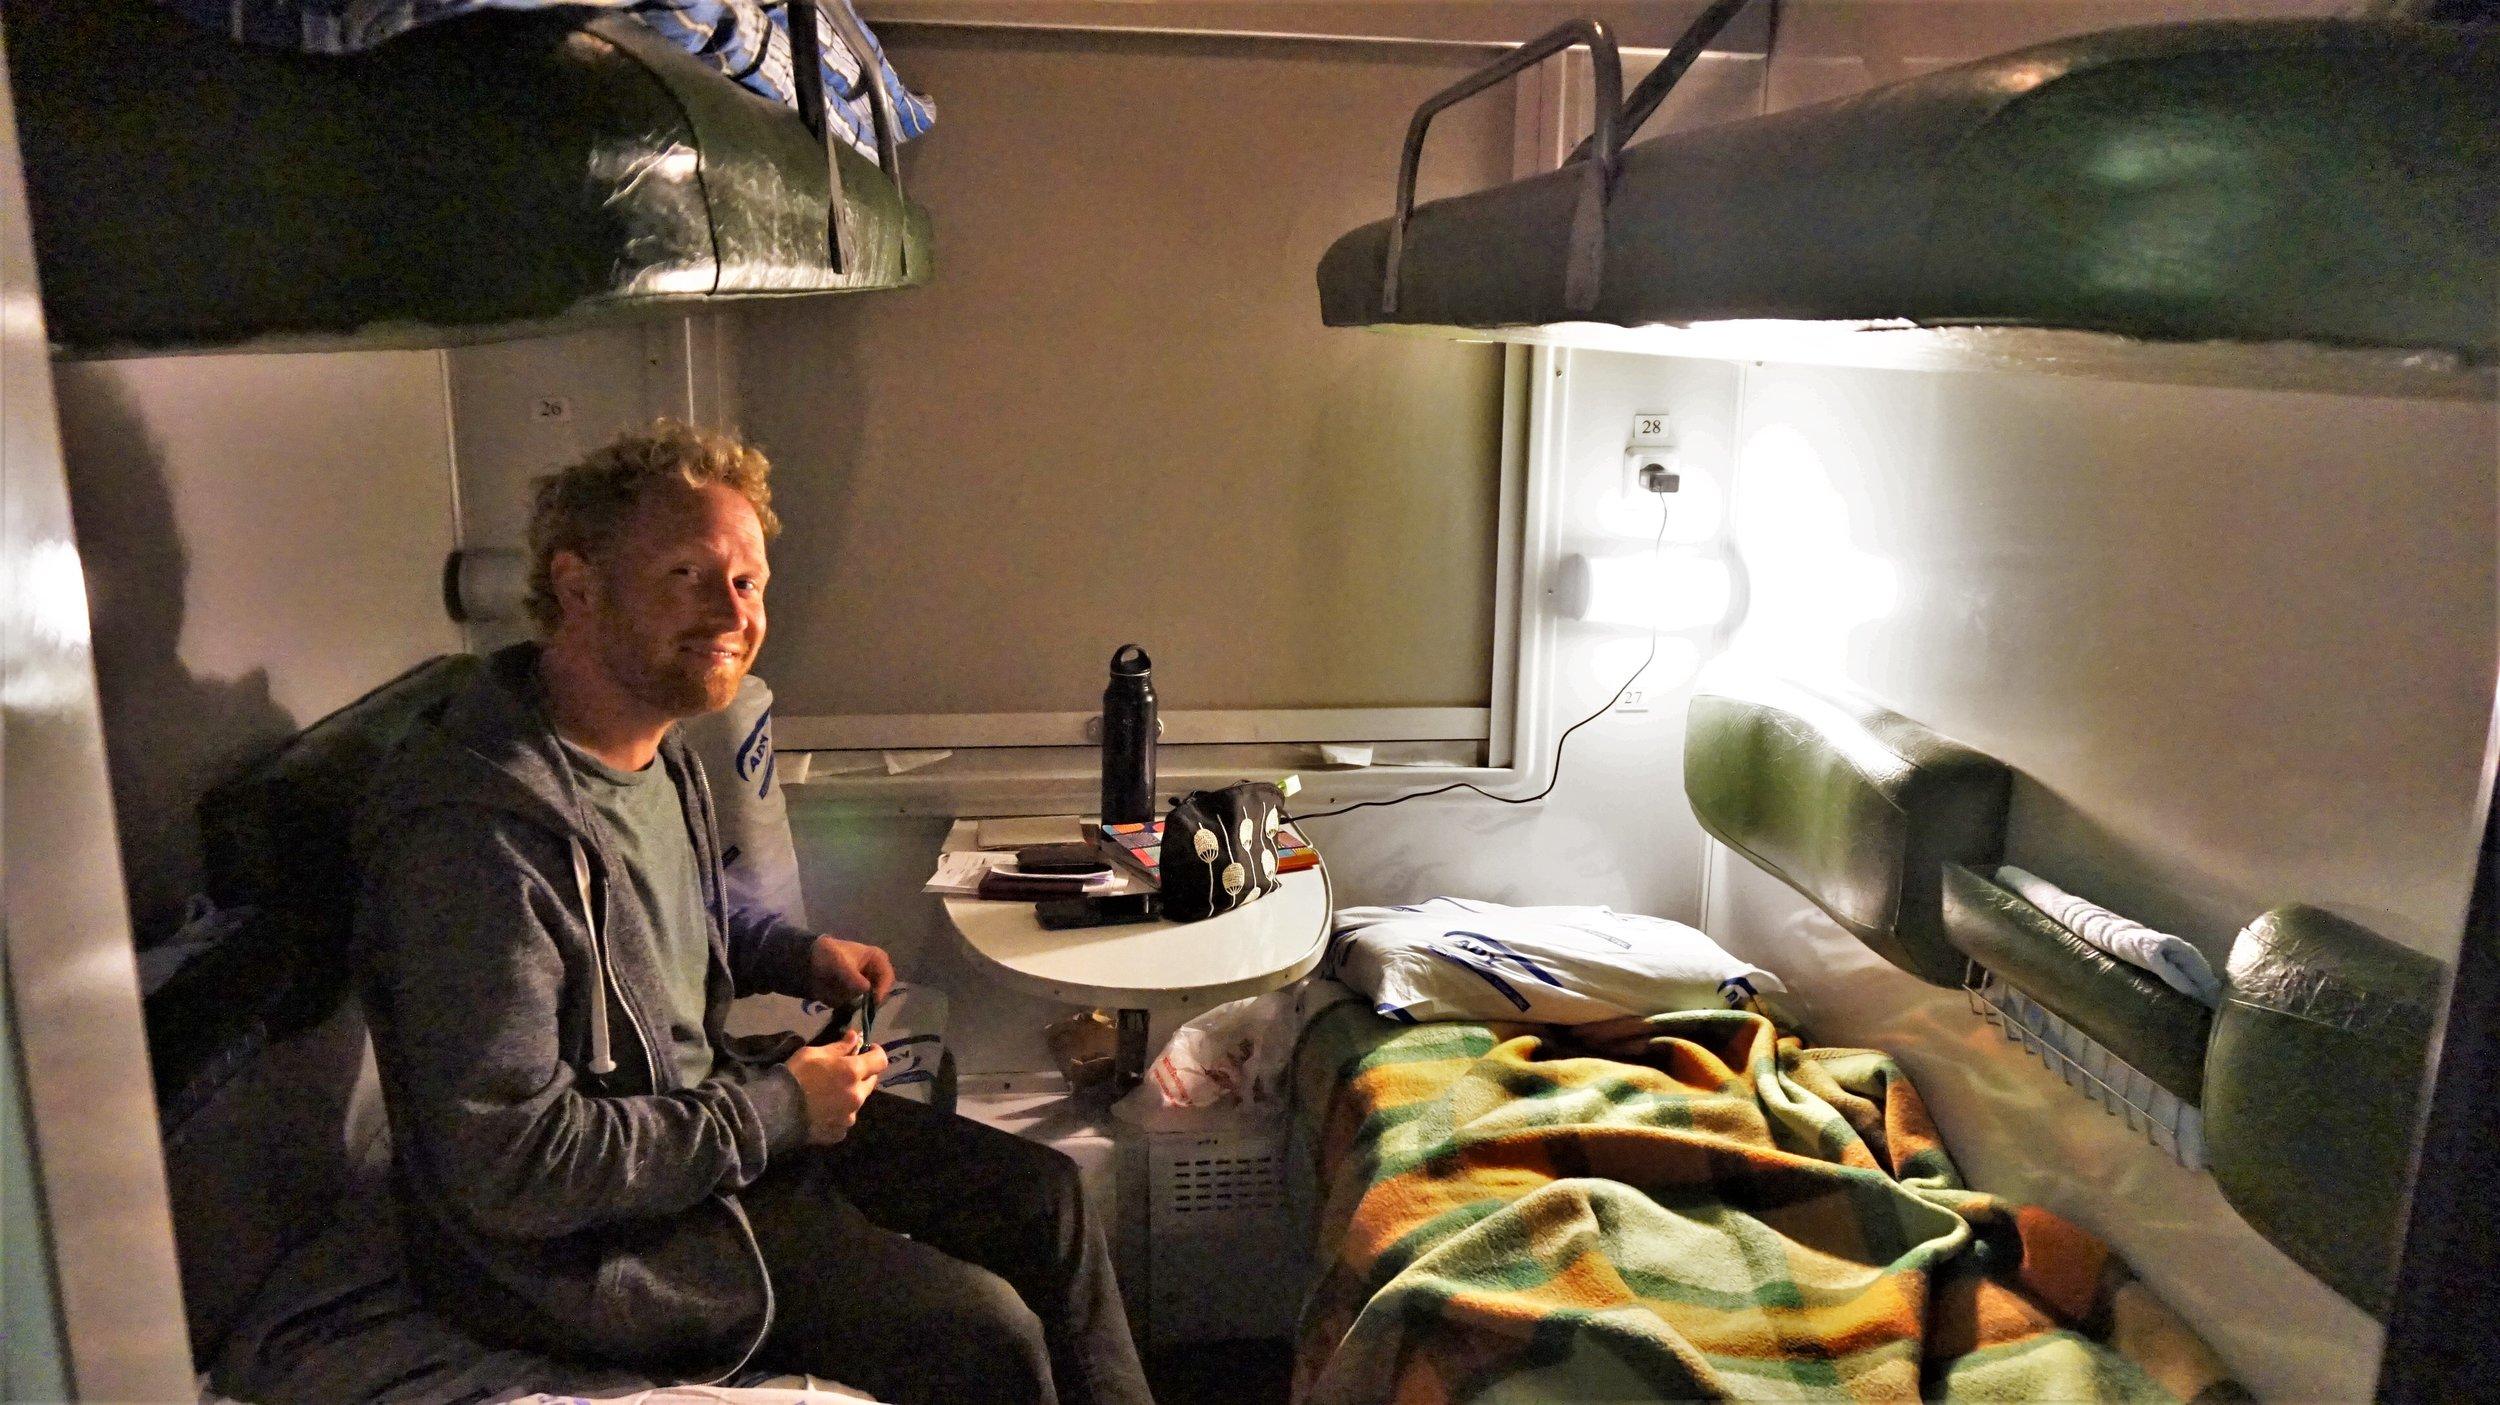 Max on the overnight train from Tbilisi to Baku, Azerbaijan